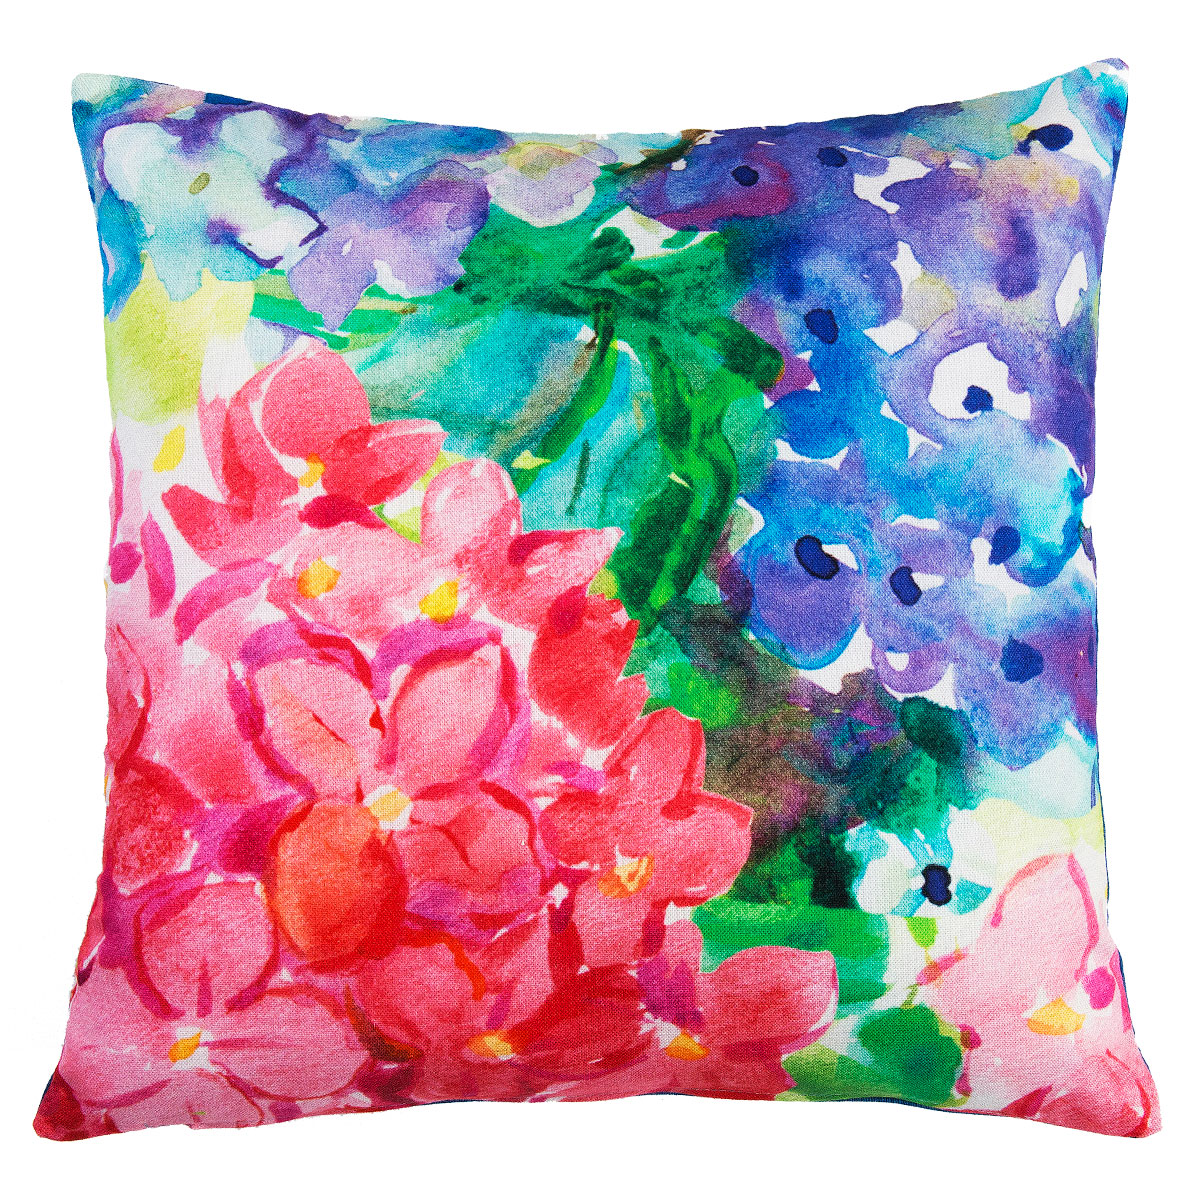 Watercolour Floral Digital Print Cushion Covers Sw Living